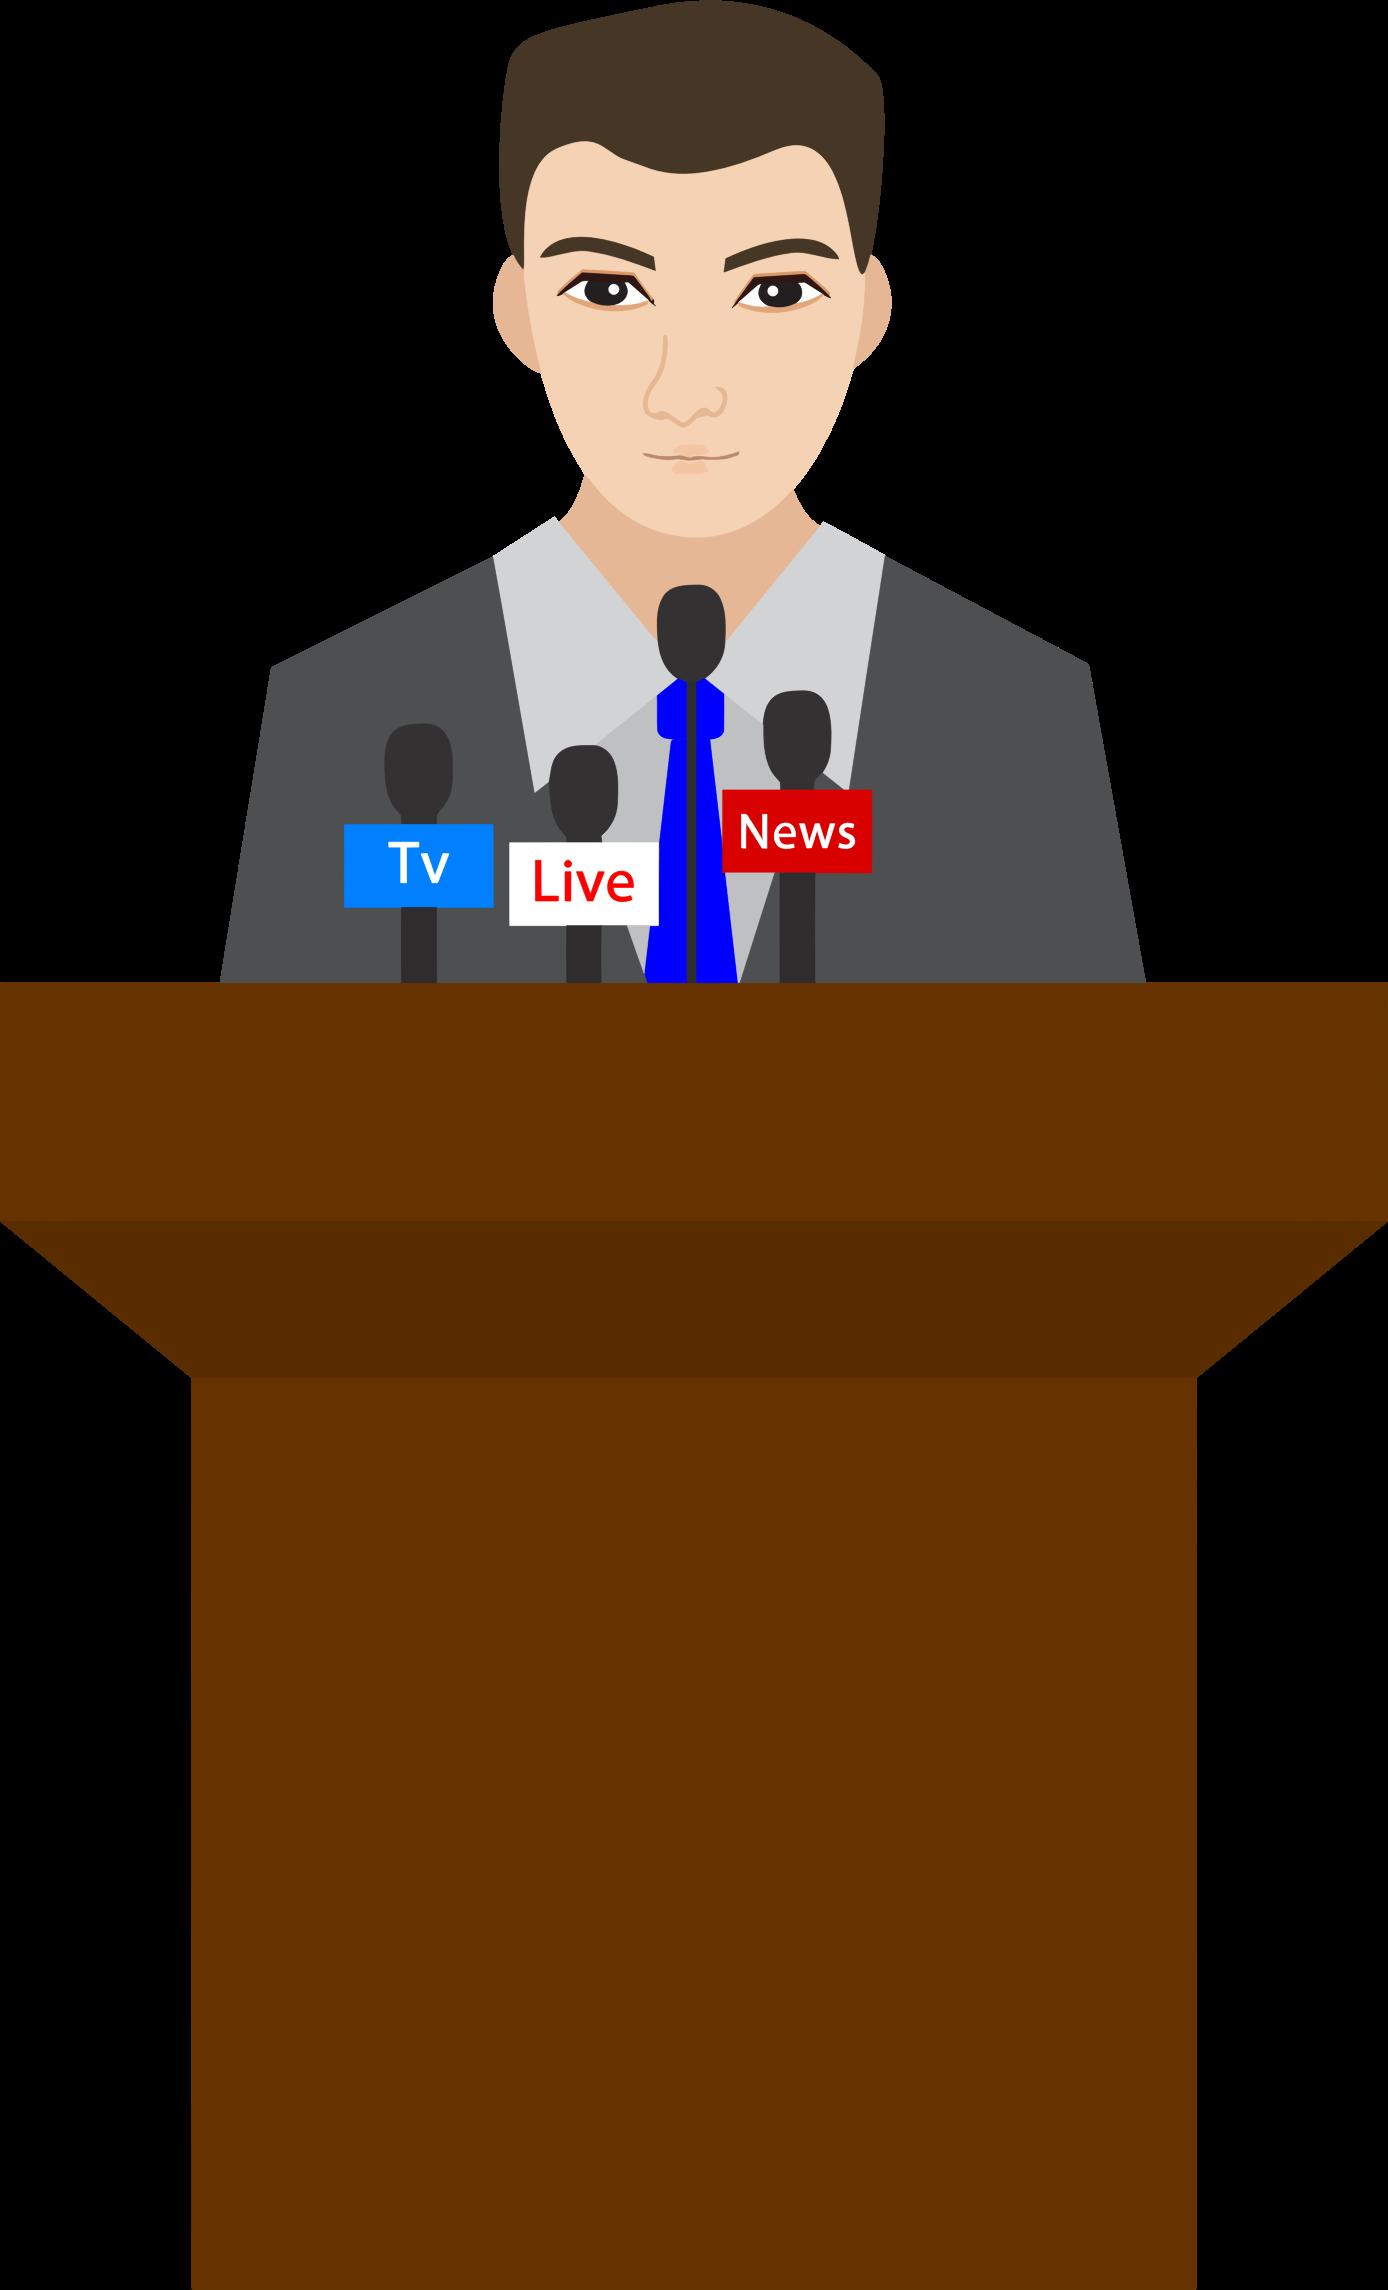 Microphone clipart podium. Man big image png